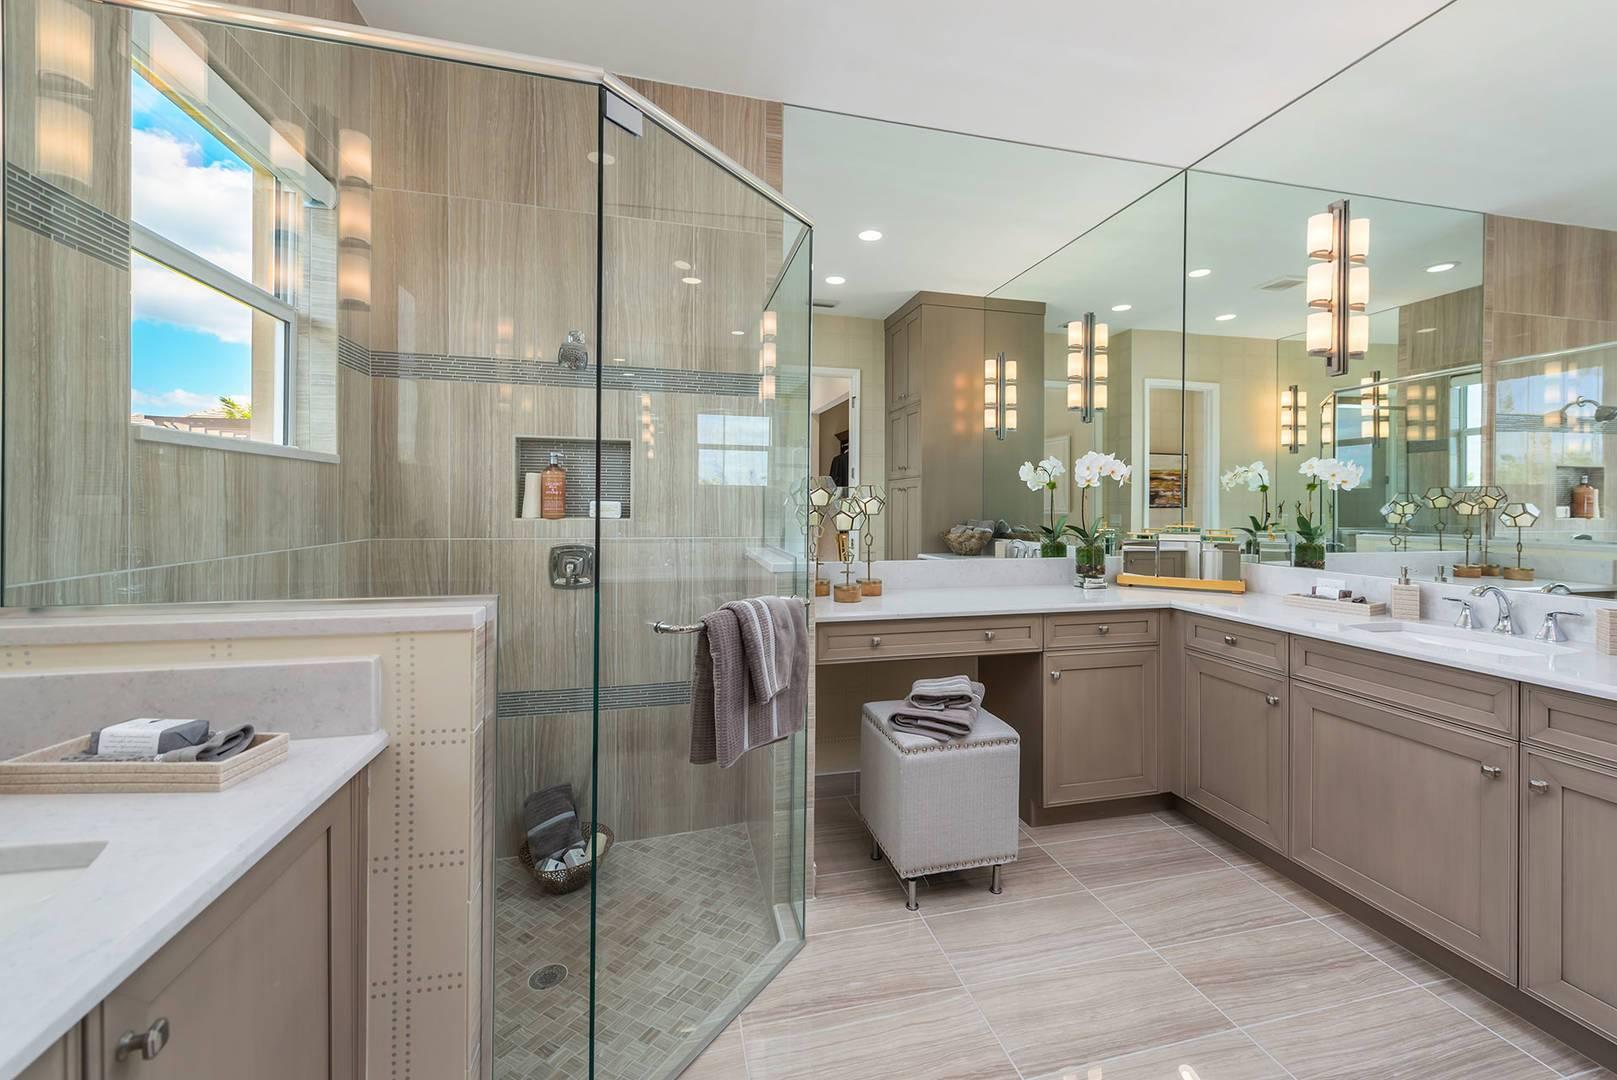 Bathroom featured in the Sierra By GL Homes in Tampa-St. Petersburg, FL